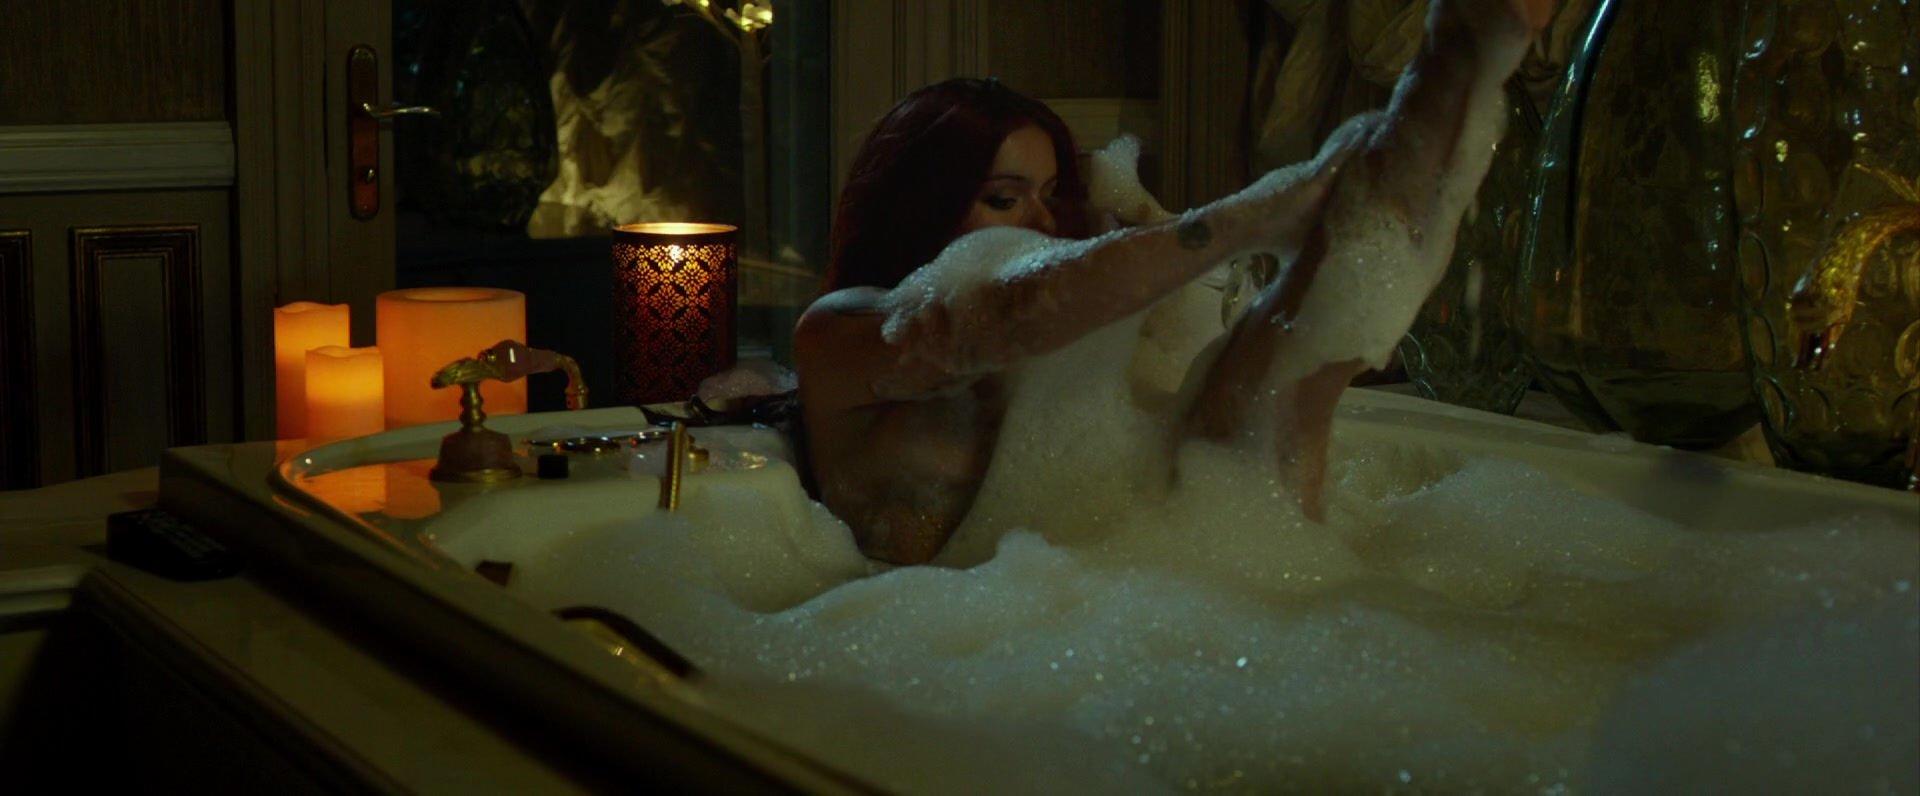 ariel winter nude movies